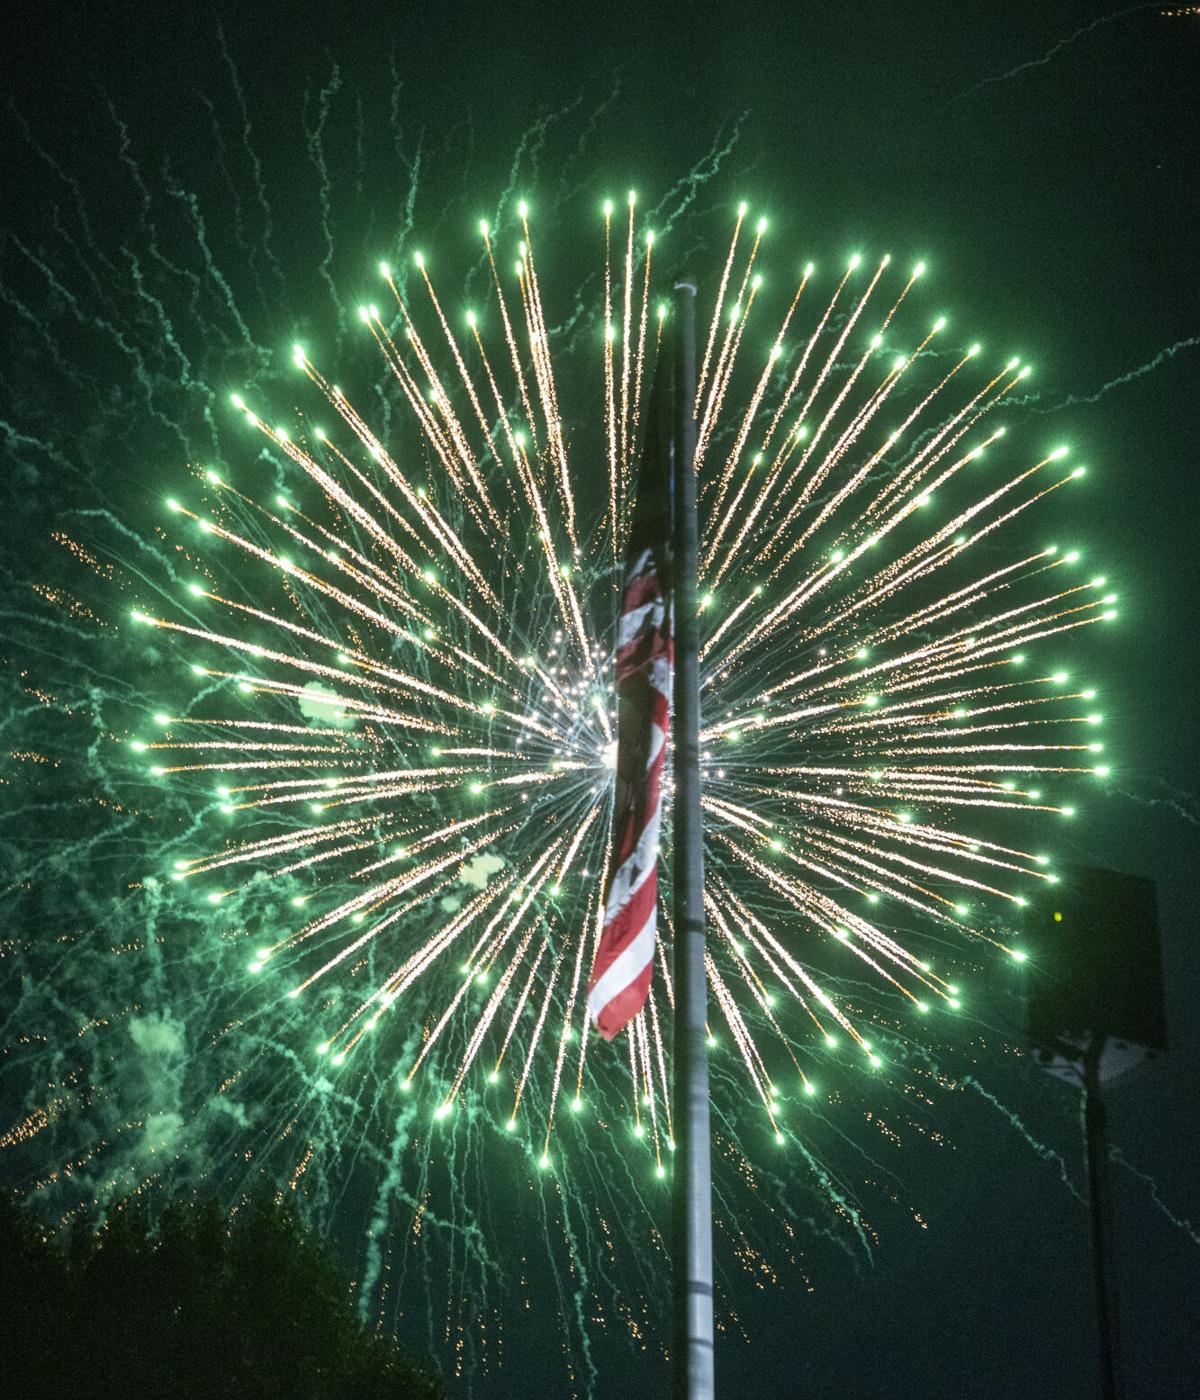 Fireworks B09I5910.jpg